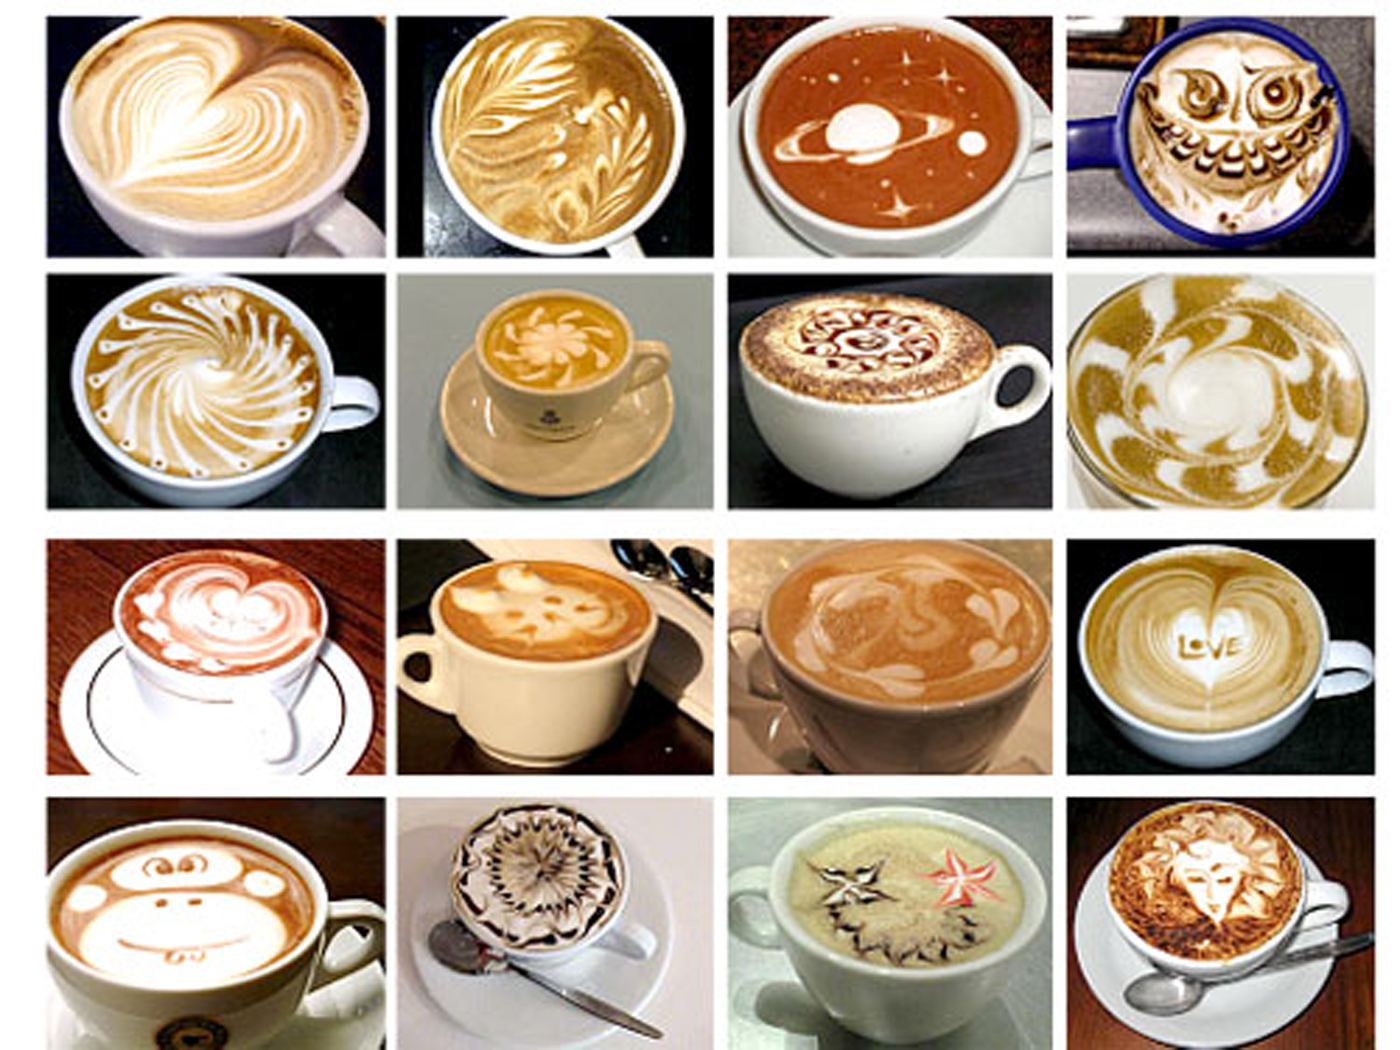 кофе рисунки 2